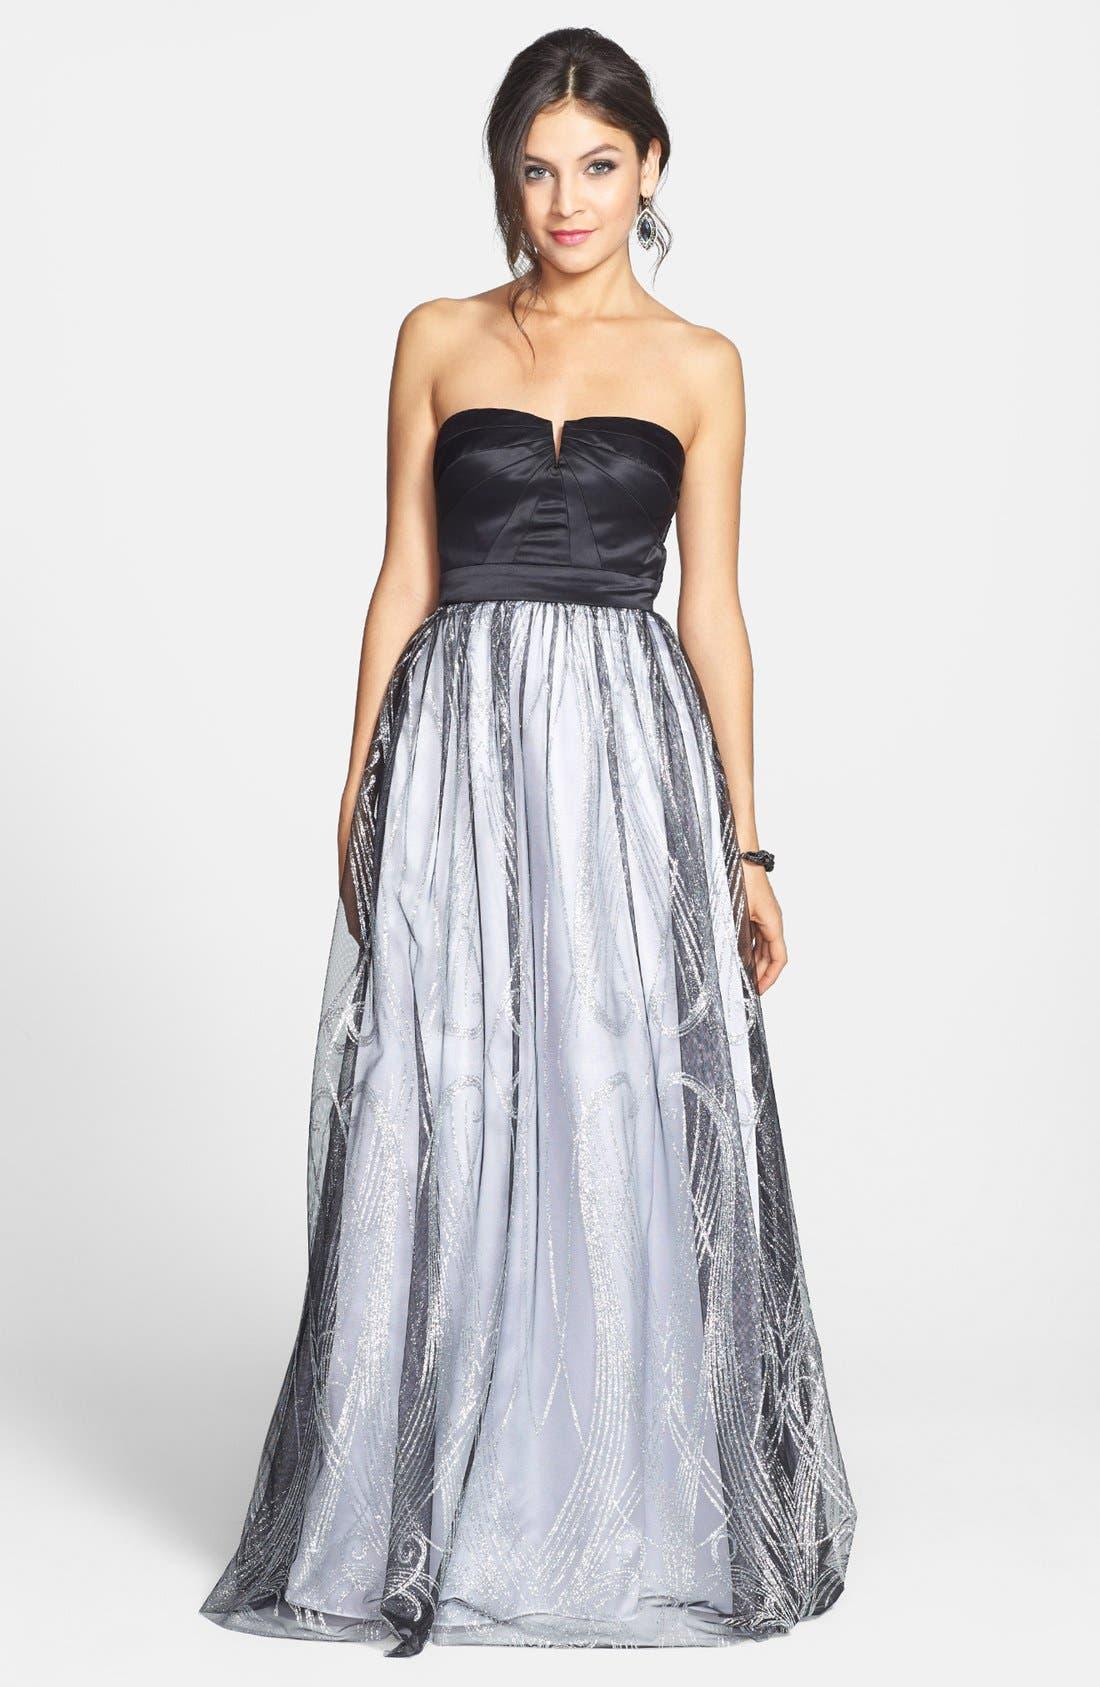 Alternate Image 1 Selected - Hailey Logan Satin & Glitter Mesh Gown (Juniors) (Online Only)